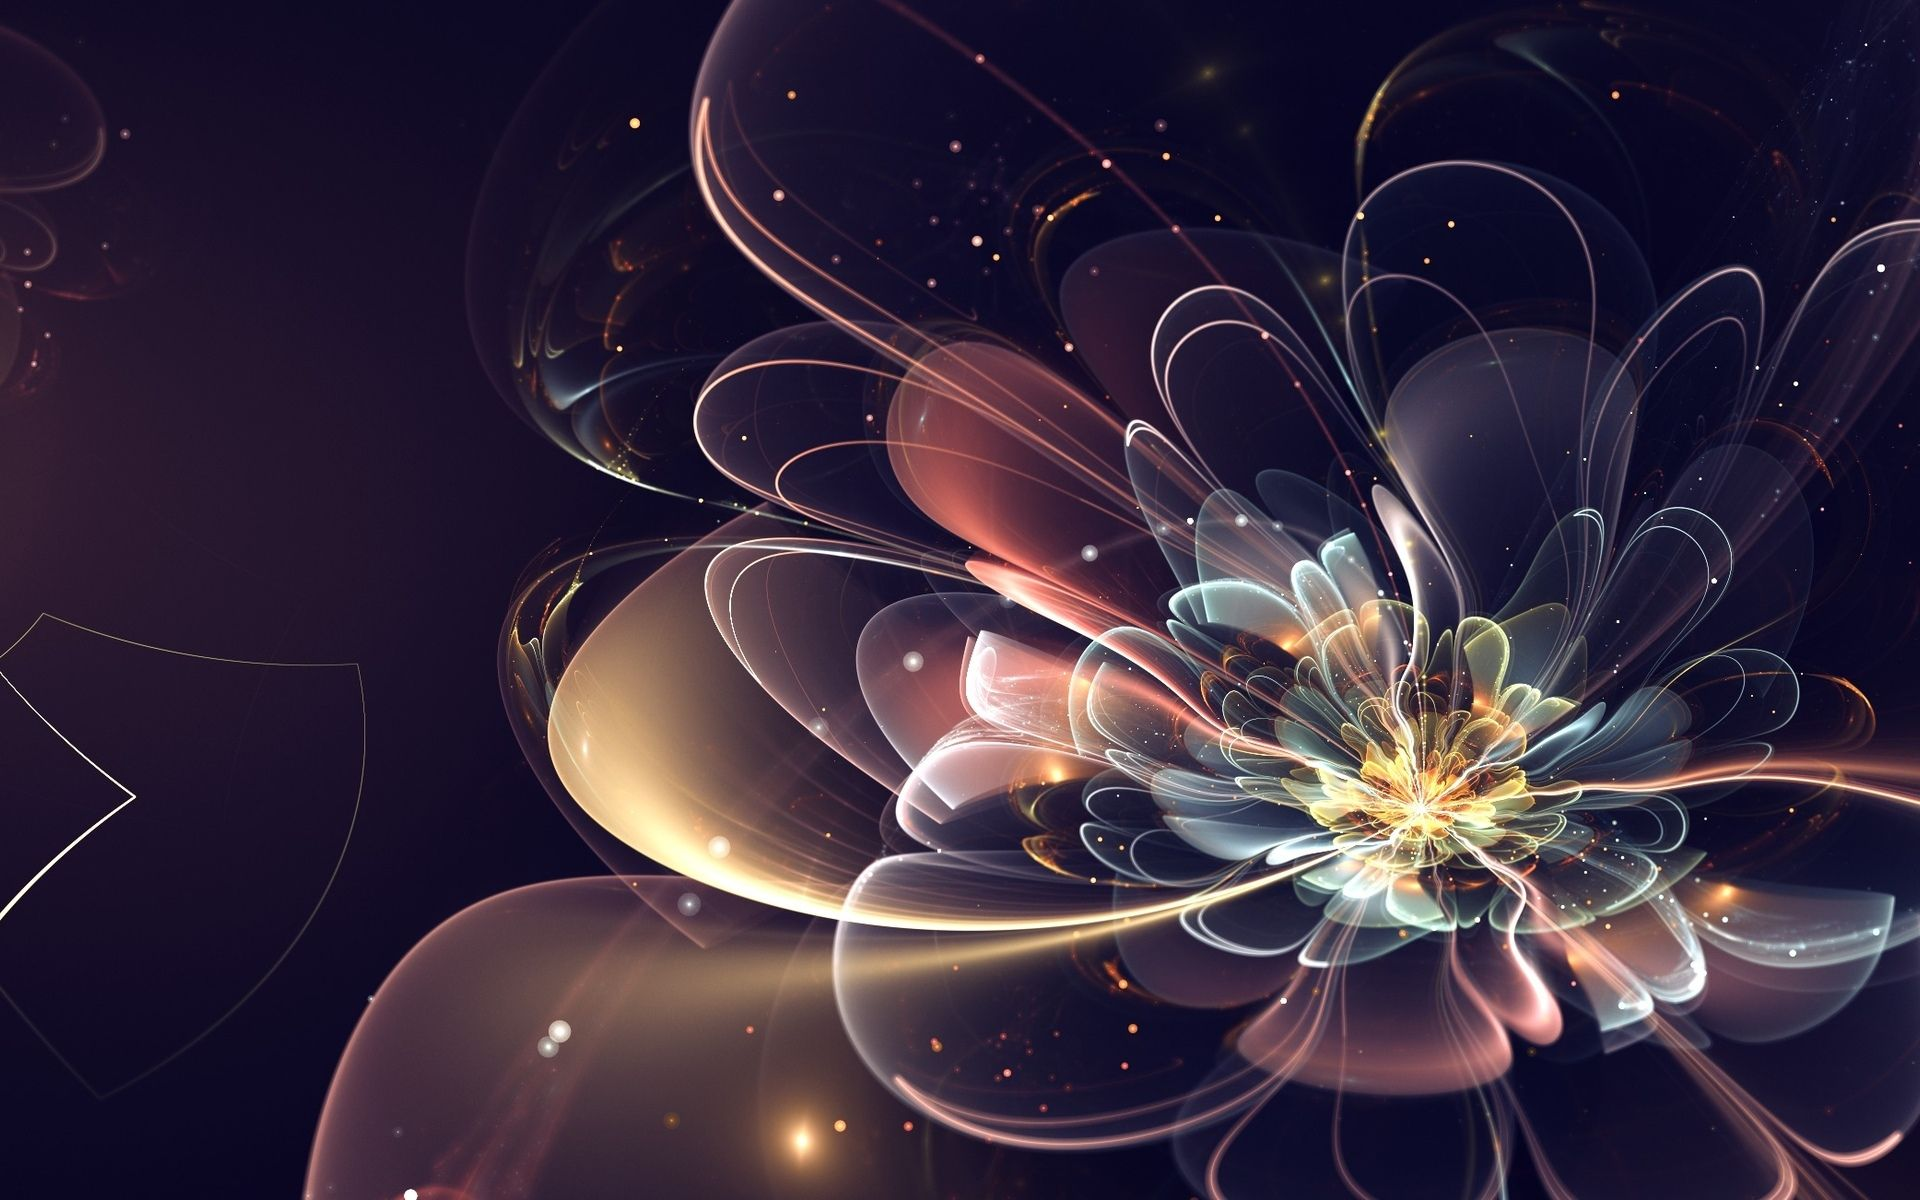 <p>Abstract</p>